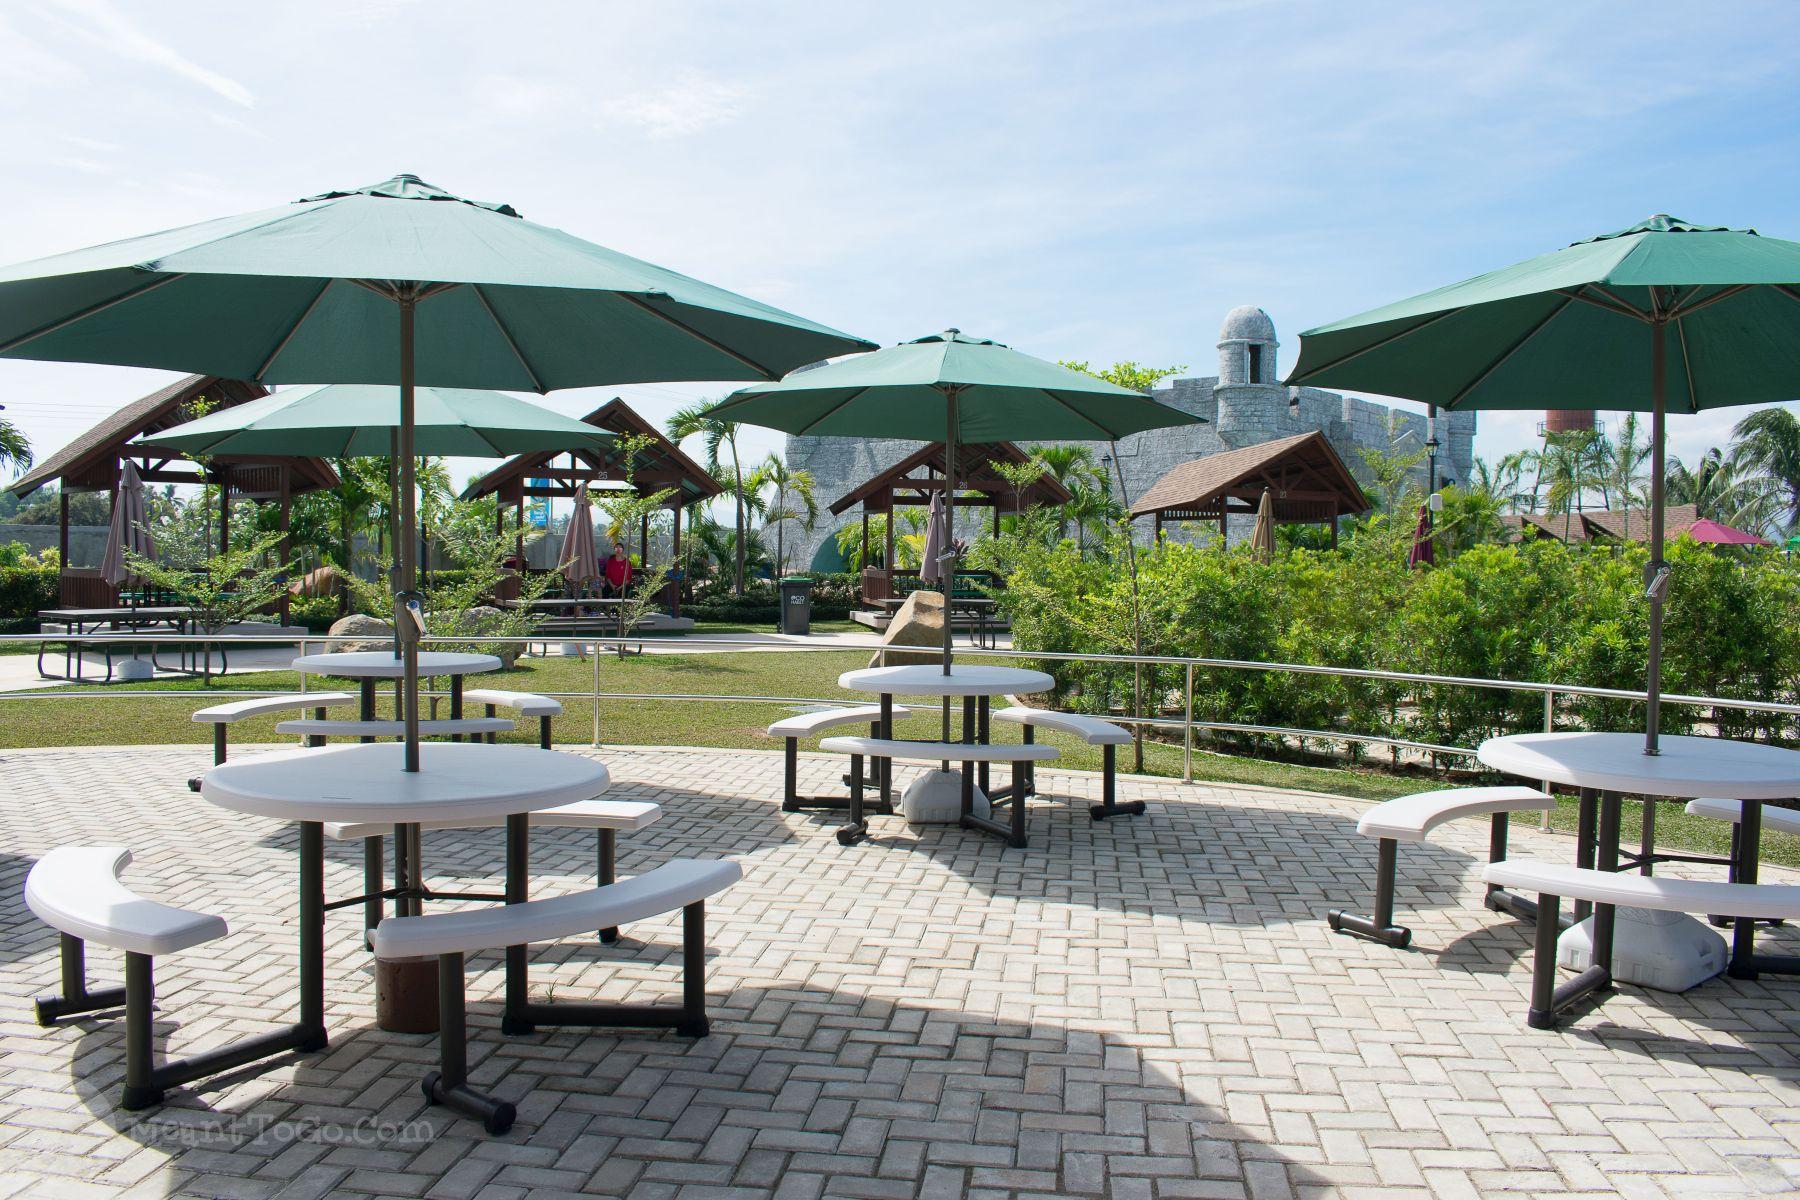 Umbrella Collages, Seven Seas Waterpark & Resort, Opol, Misamins Oriental